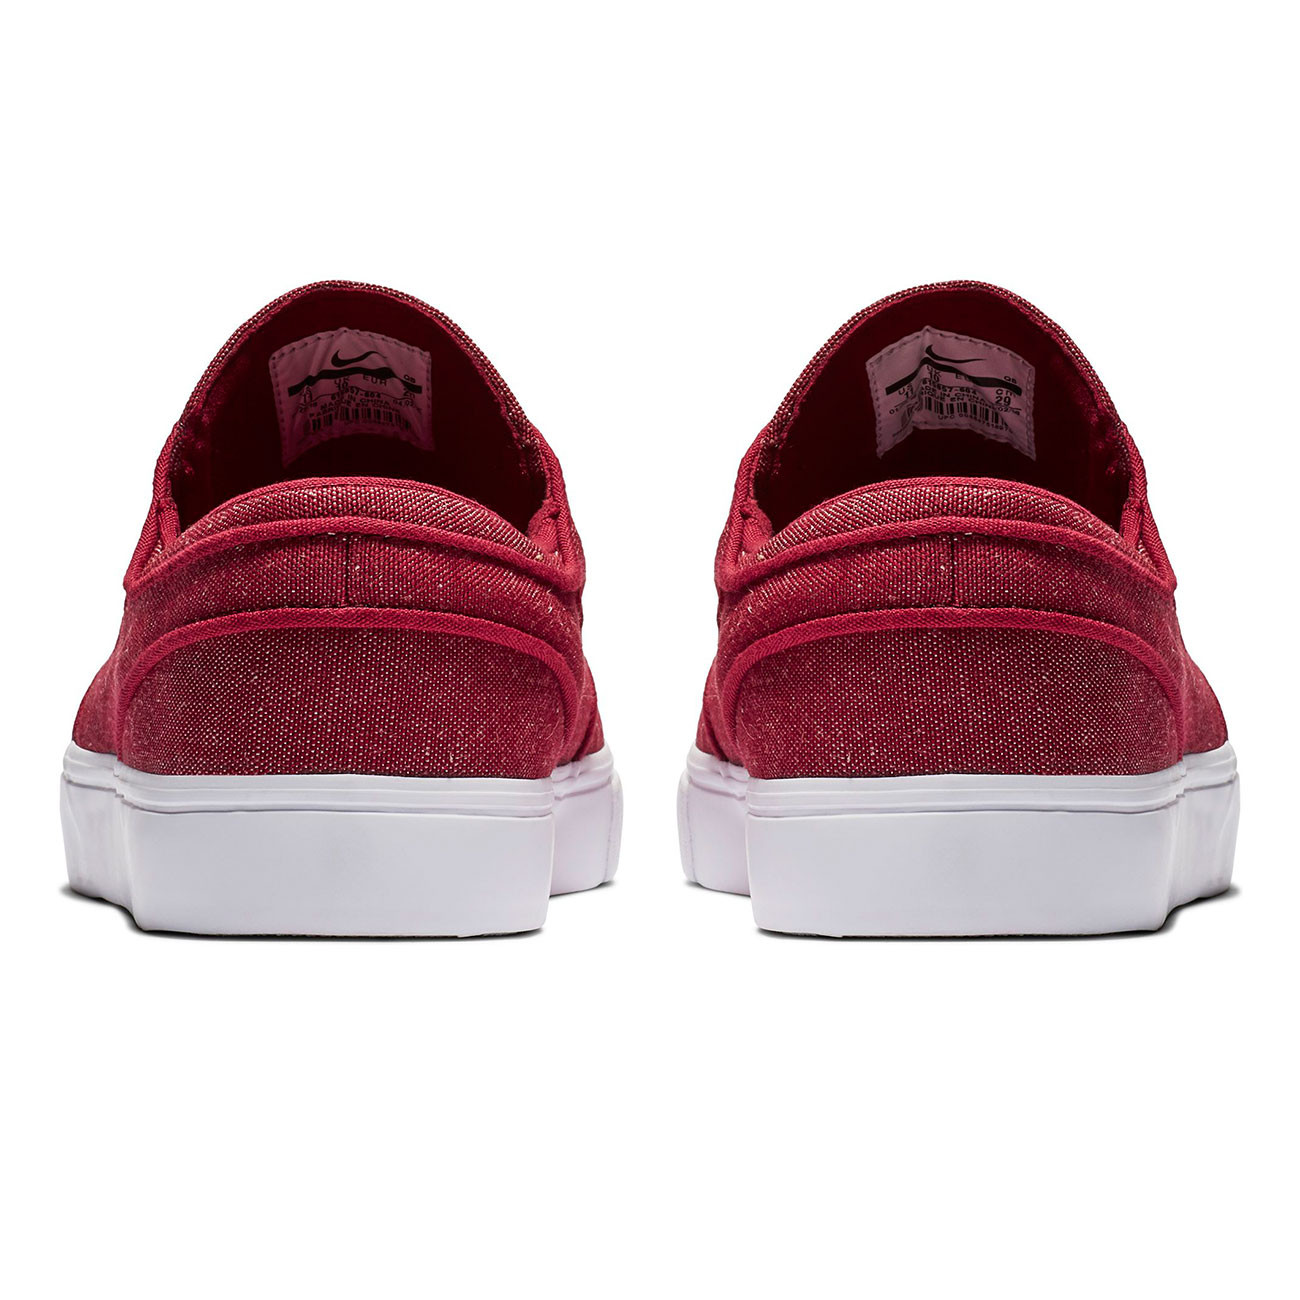 Tenisky Nike SB Zoom Stefan Janoski Canvas red crush red crush-white 6bc6b3fa37